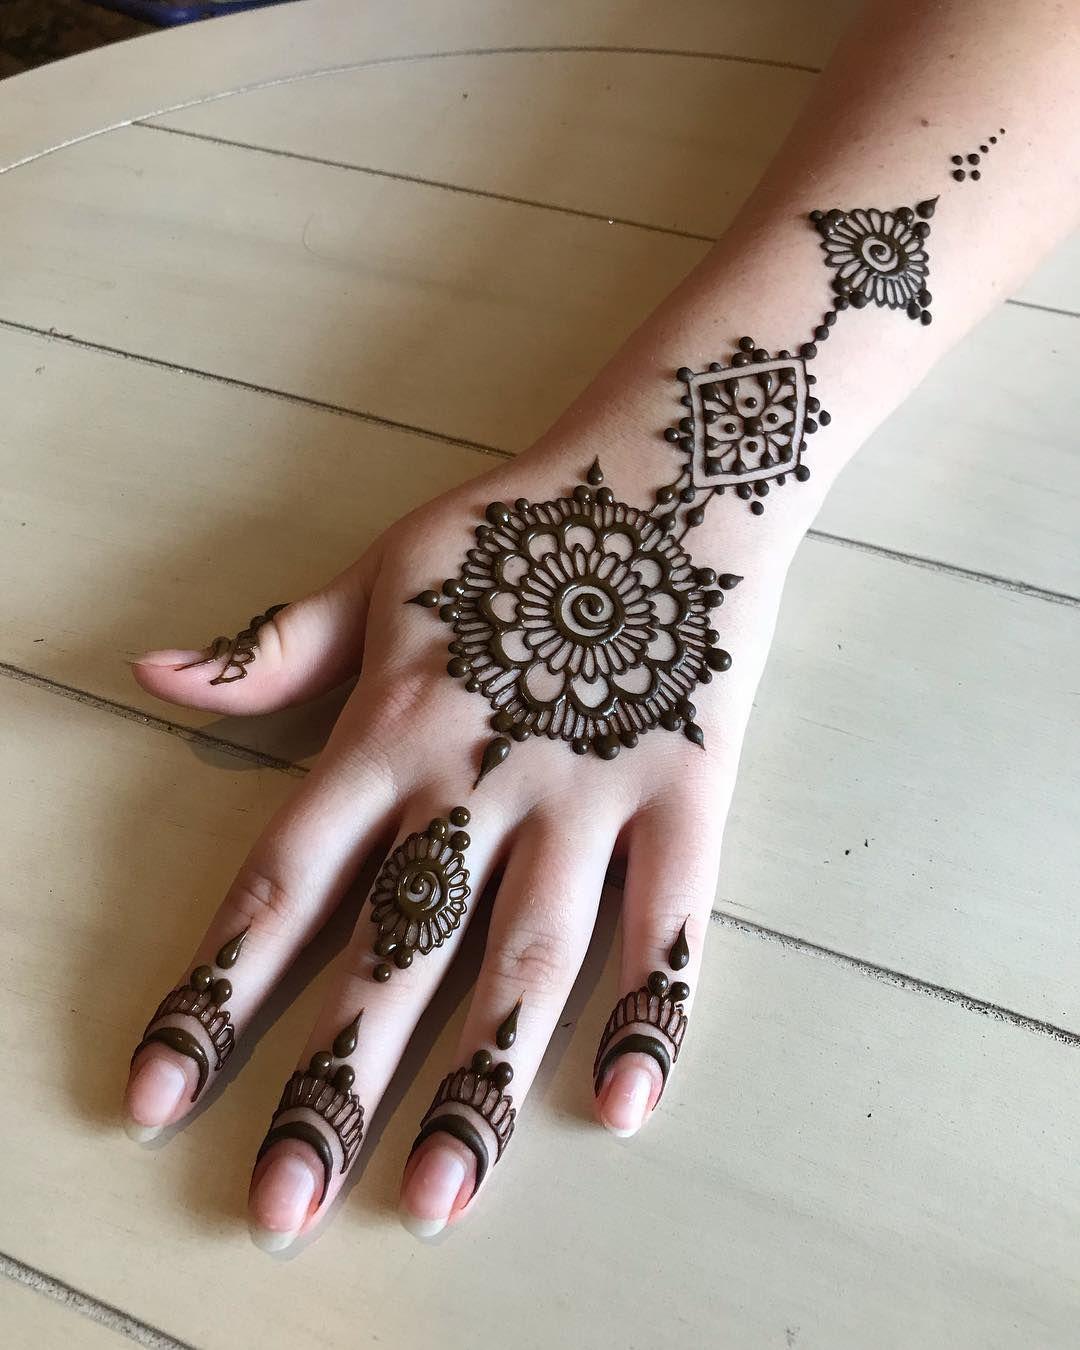 800 Gambar Henna Bts HD Paling Baru Infobaru